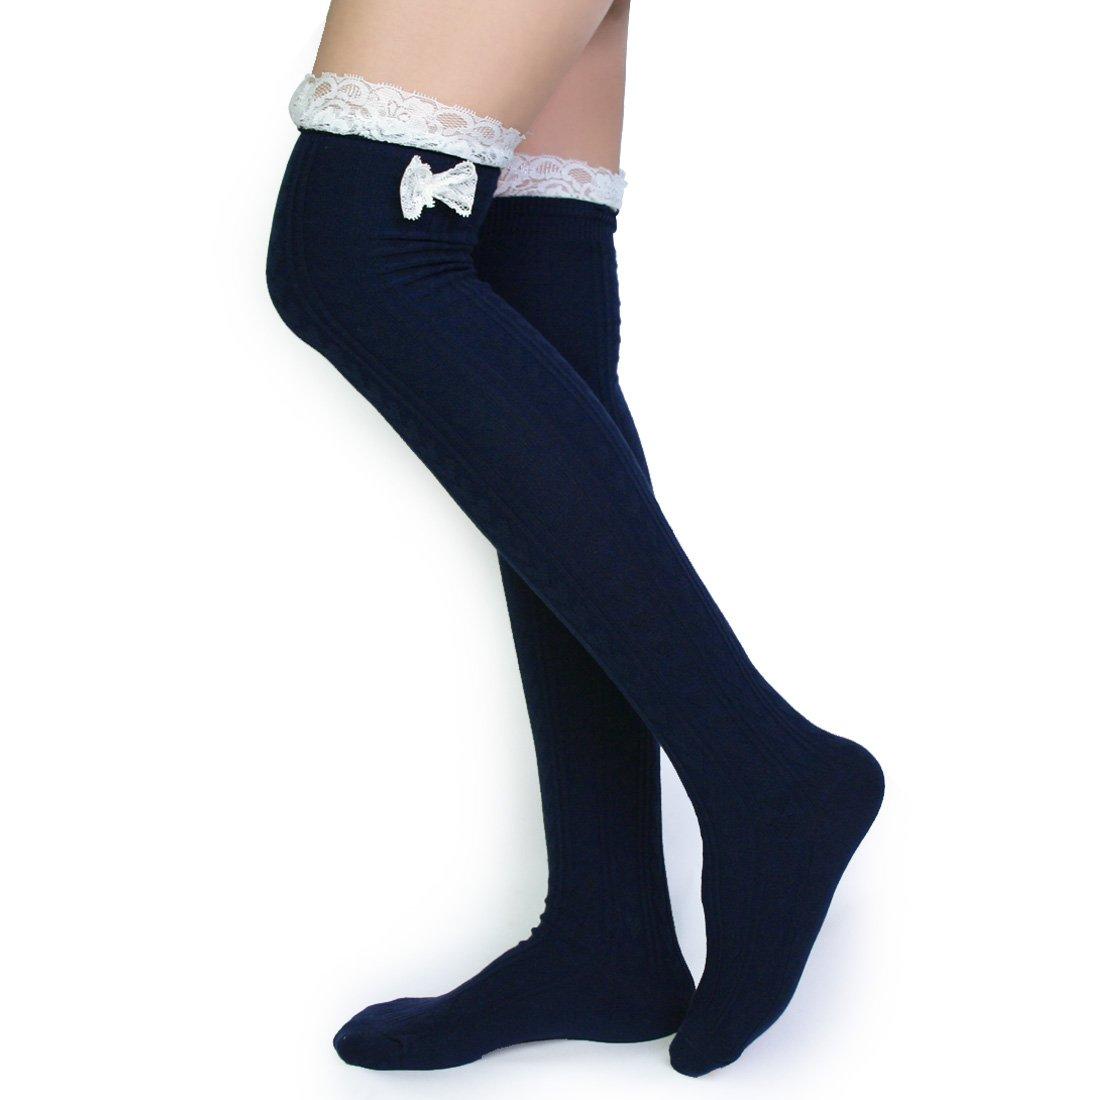 580bdb18703 Amazon.com  Kilofly Womens Lace Trim Knee-High Boot Socks